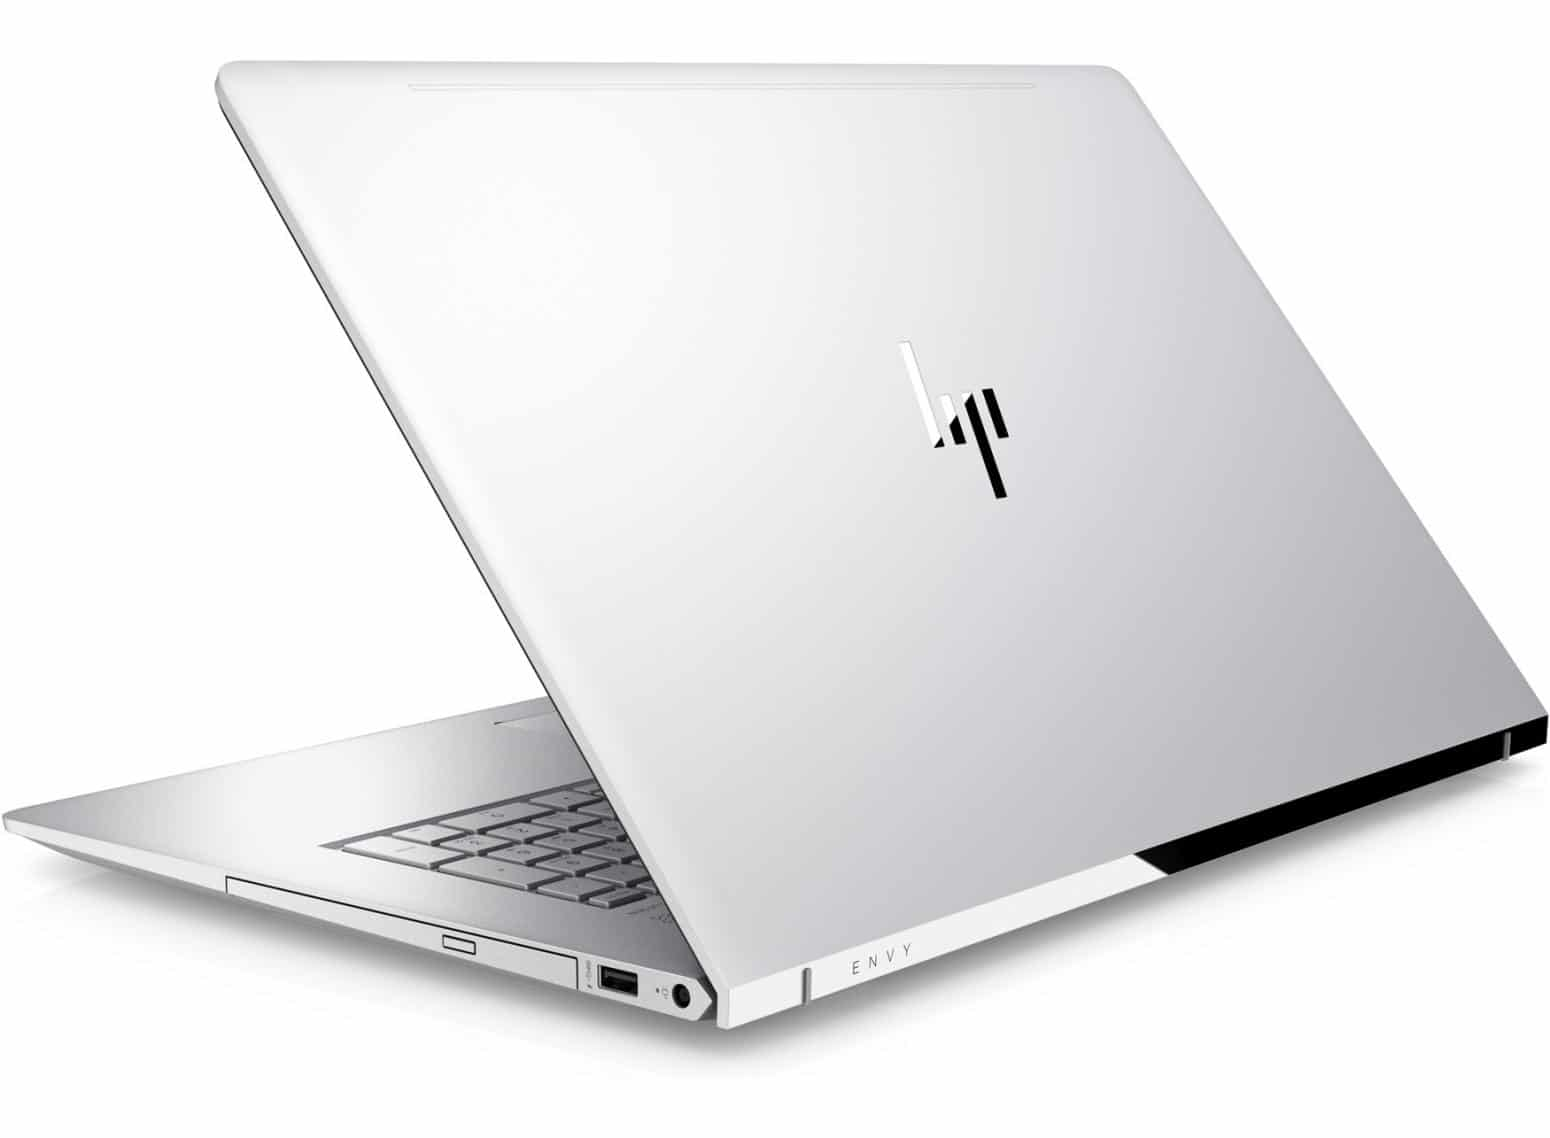 HP Envy 17-ae115nf, PC 17 pouces fin Full IPS 12Go Quad i7 MX150 (1139€)